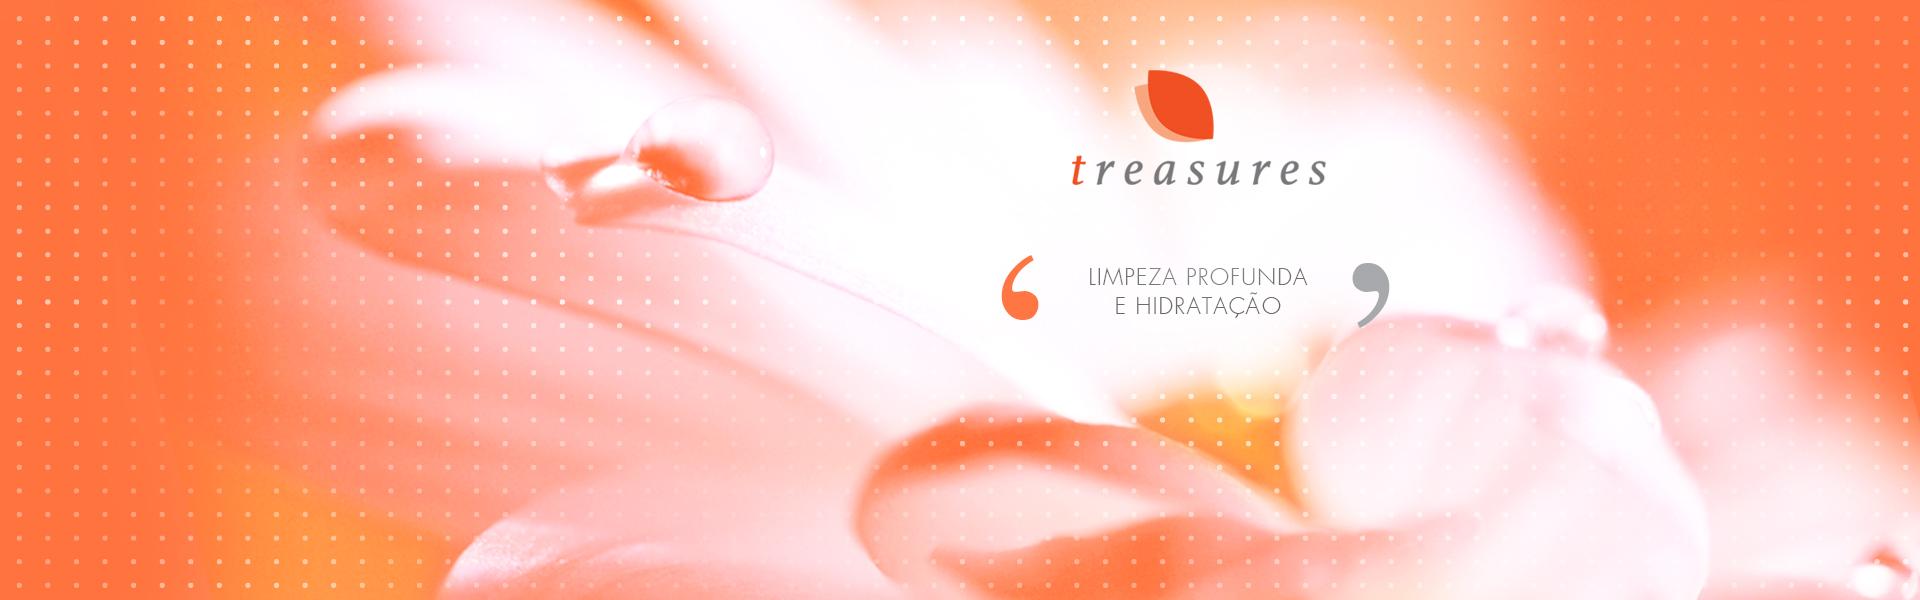 banner_centrali_TREASURES_PT